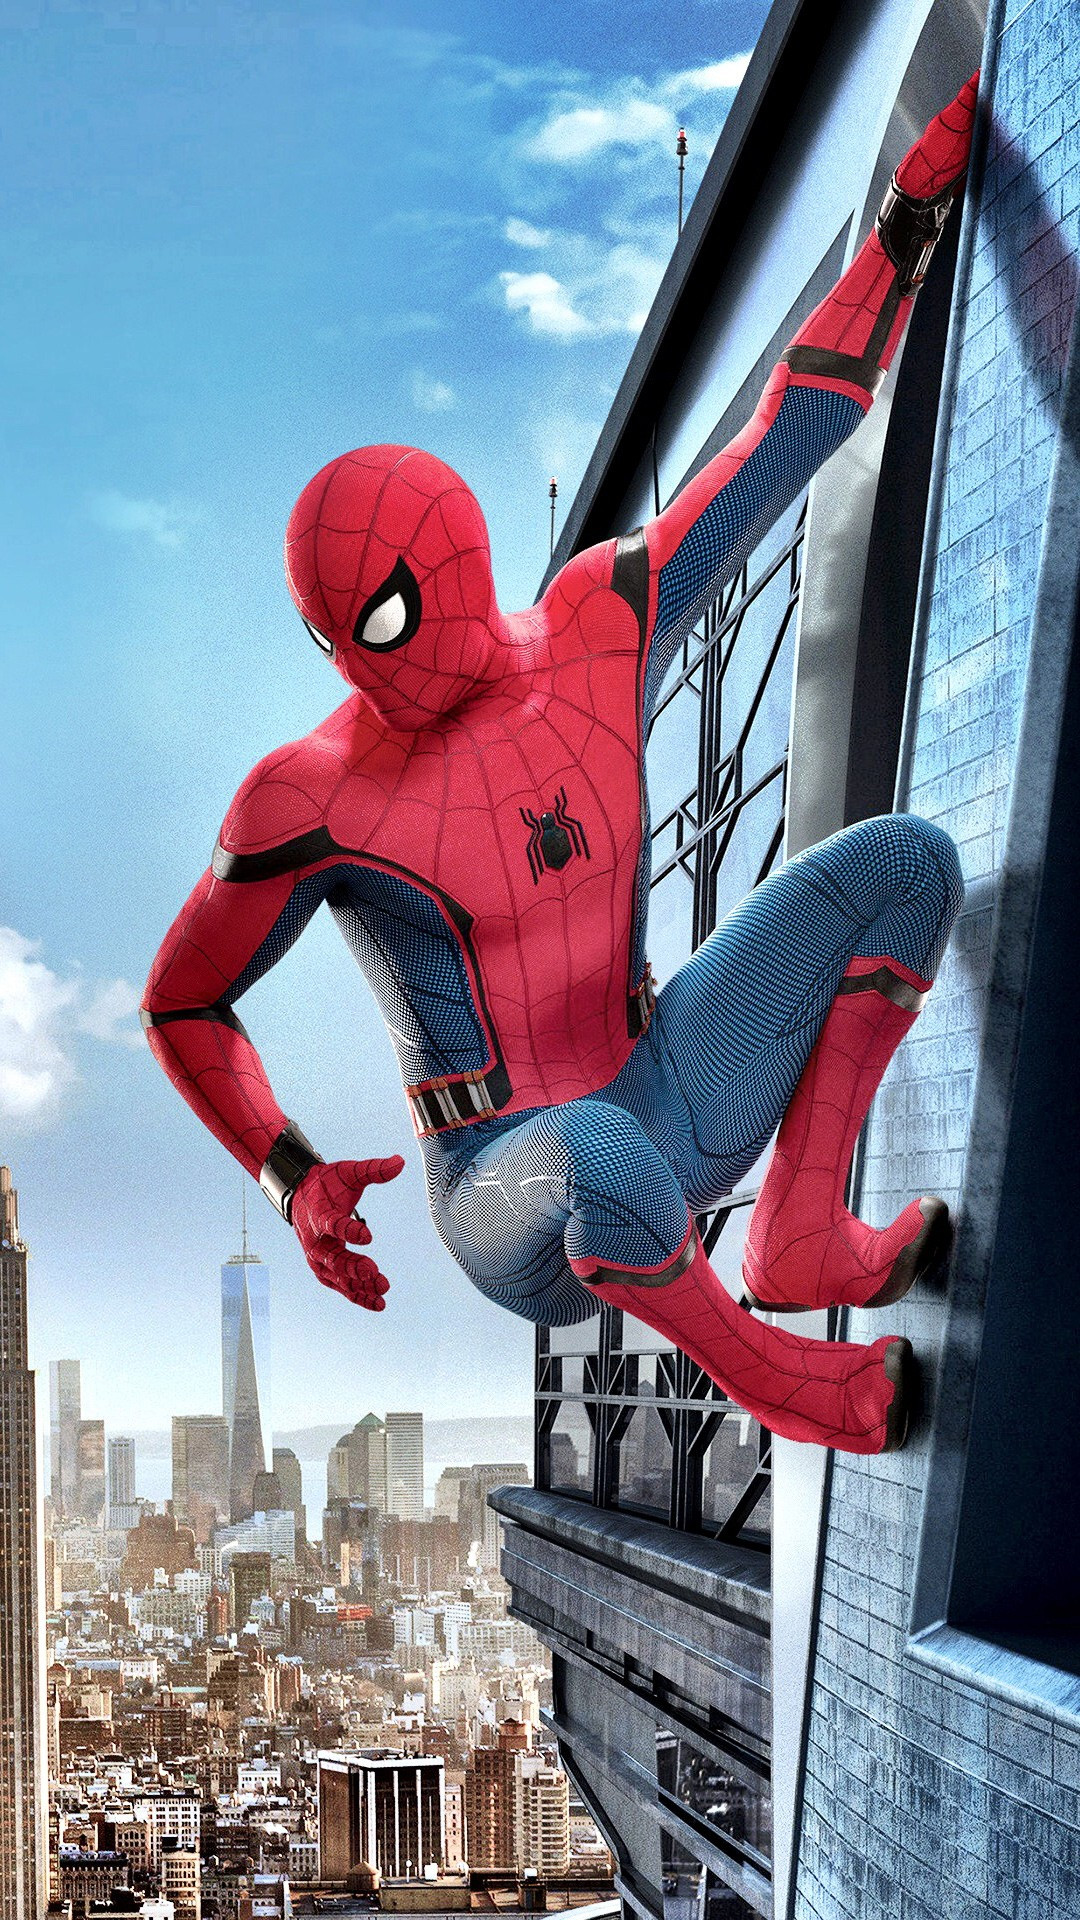 Free Download Spiderman Homecoming Wallpaper Hd